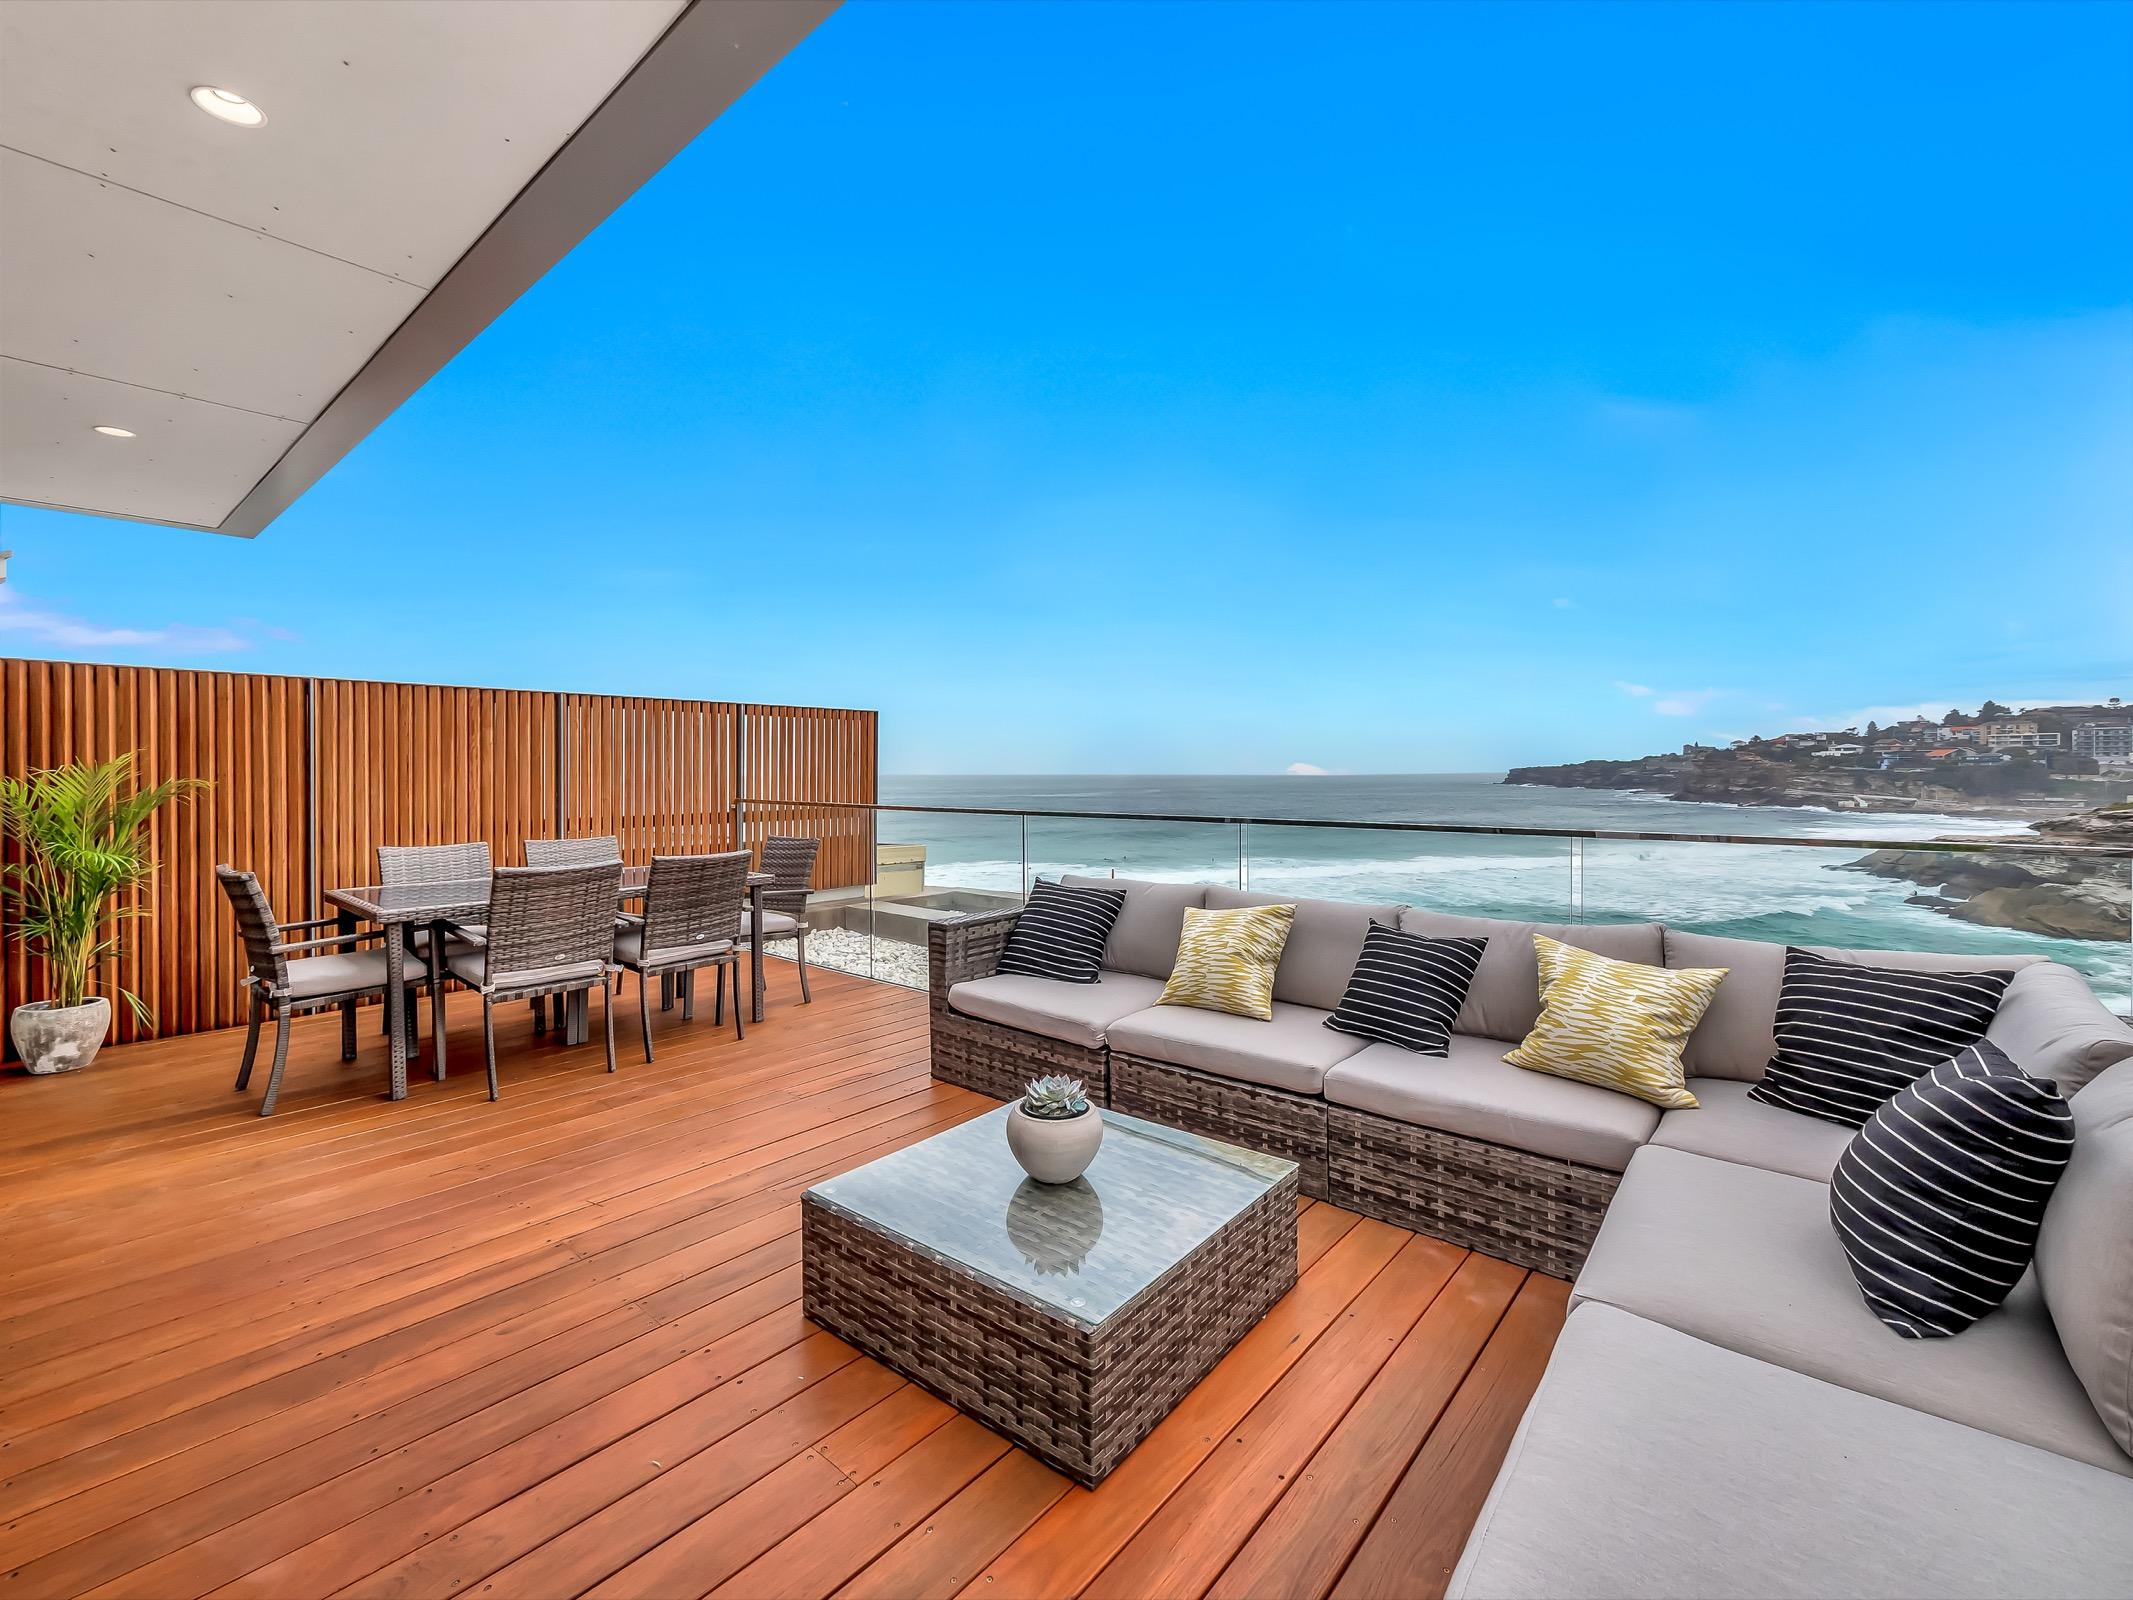 Beachfrotnt Penthouse Tamarama. Bondi Beach Holiday Homes7.jpg